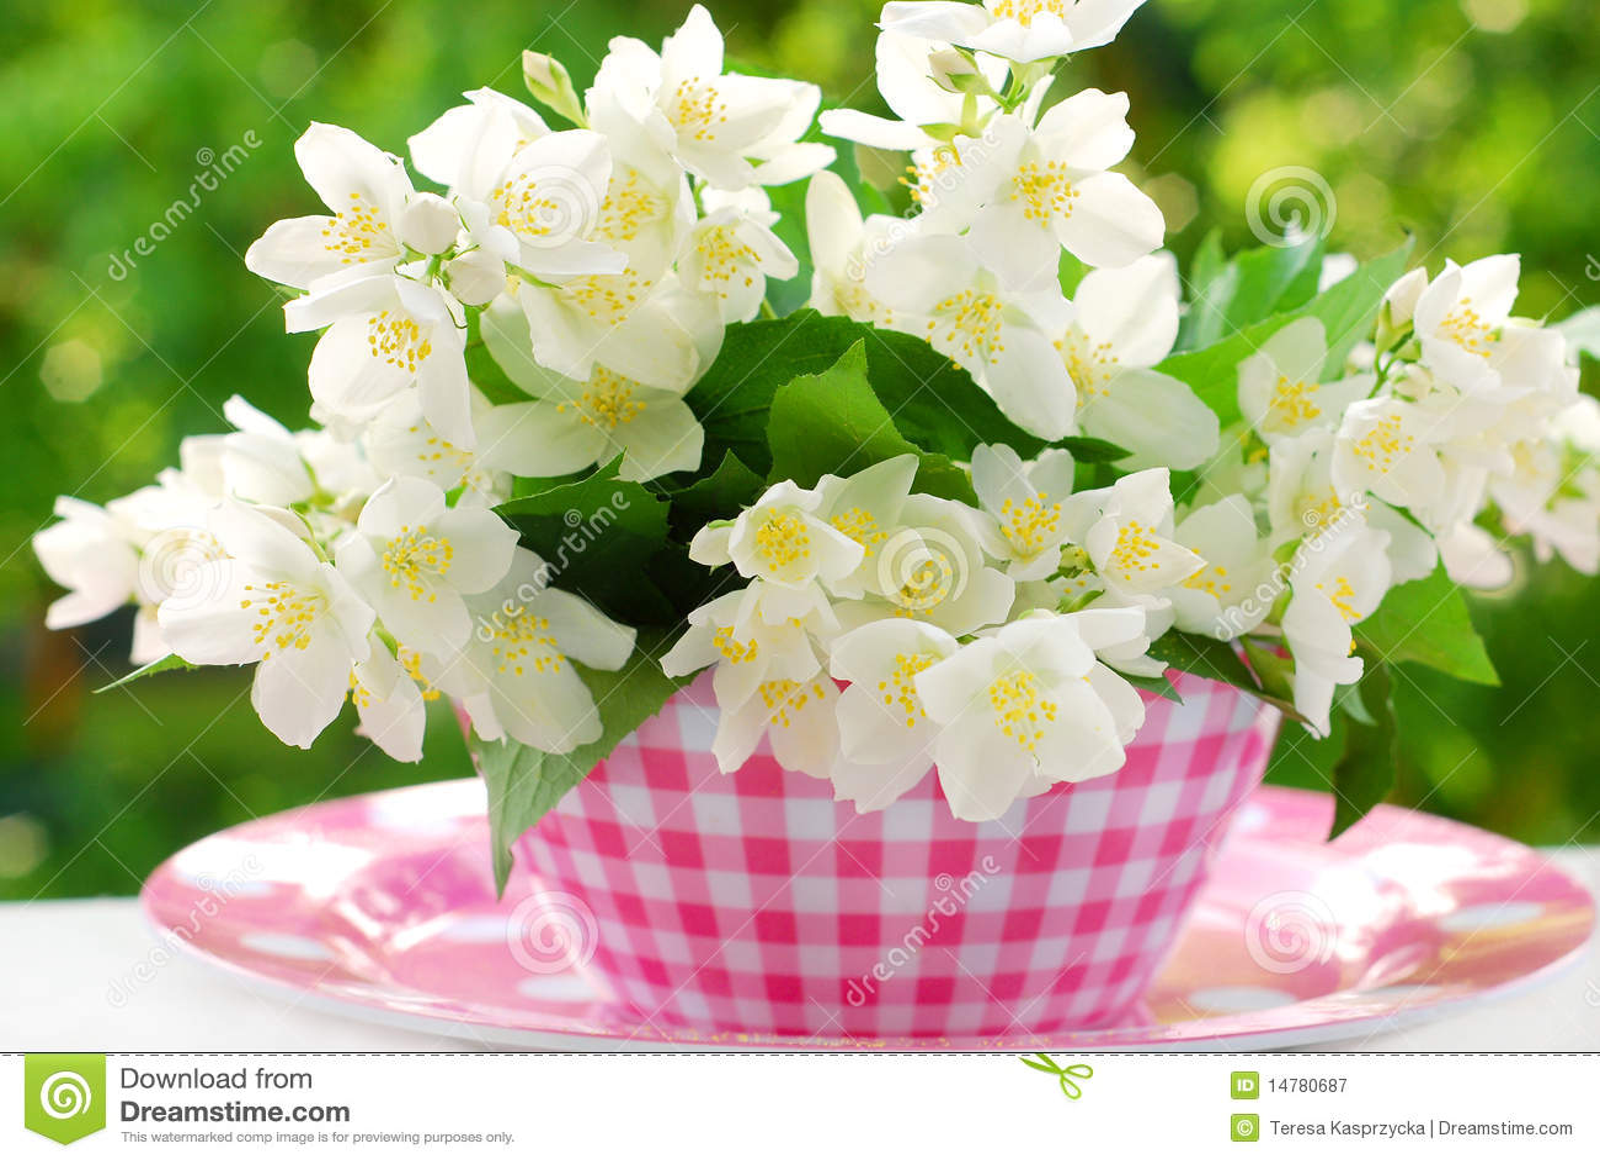 Bunch Of Jasmine Flowers Stock Image Image Of Spring 14780687